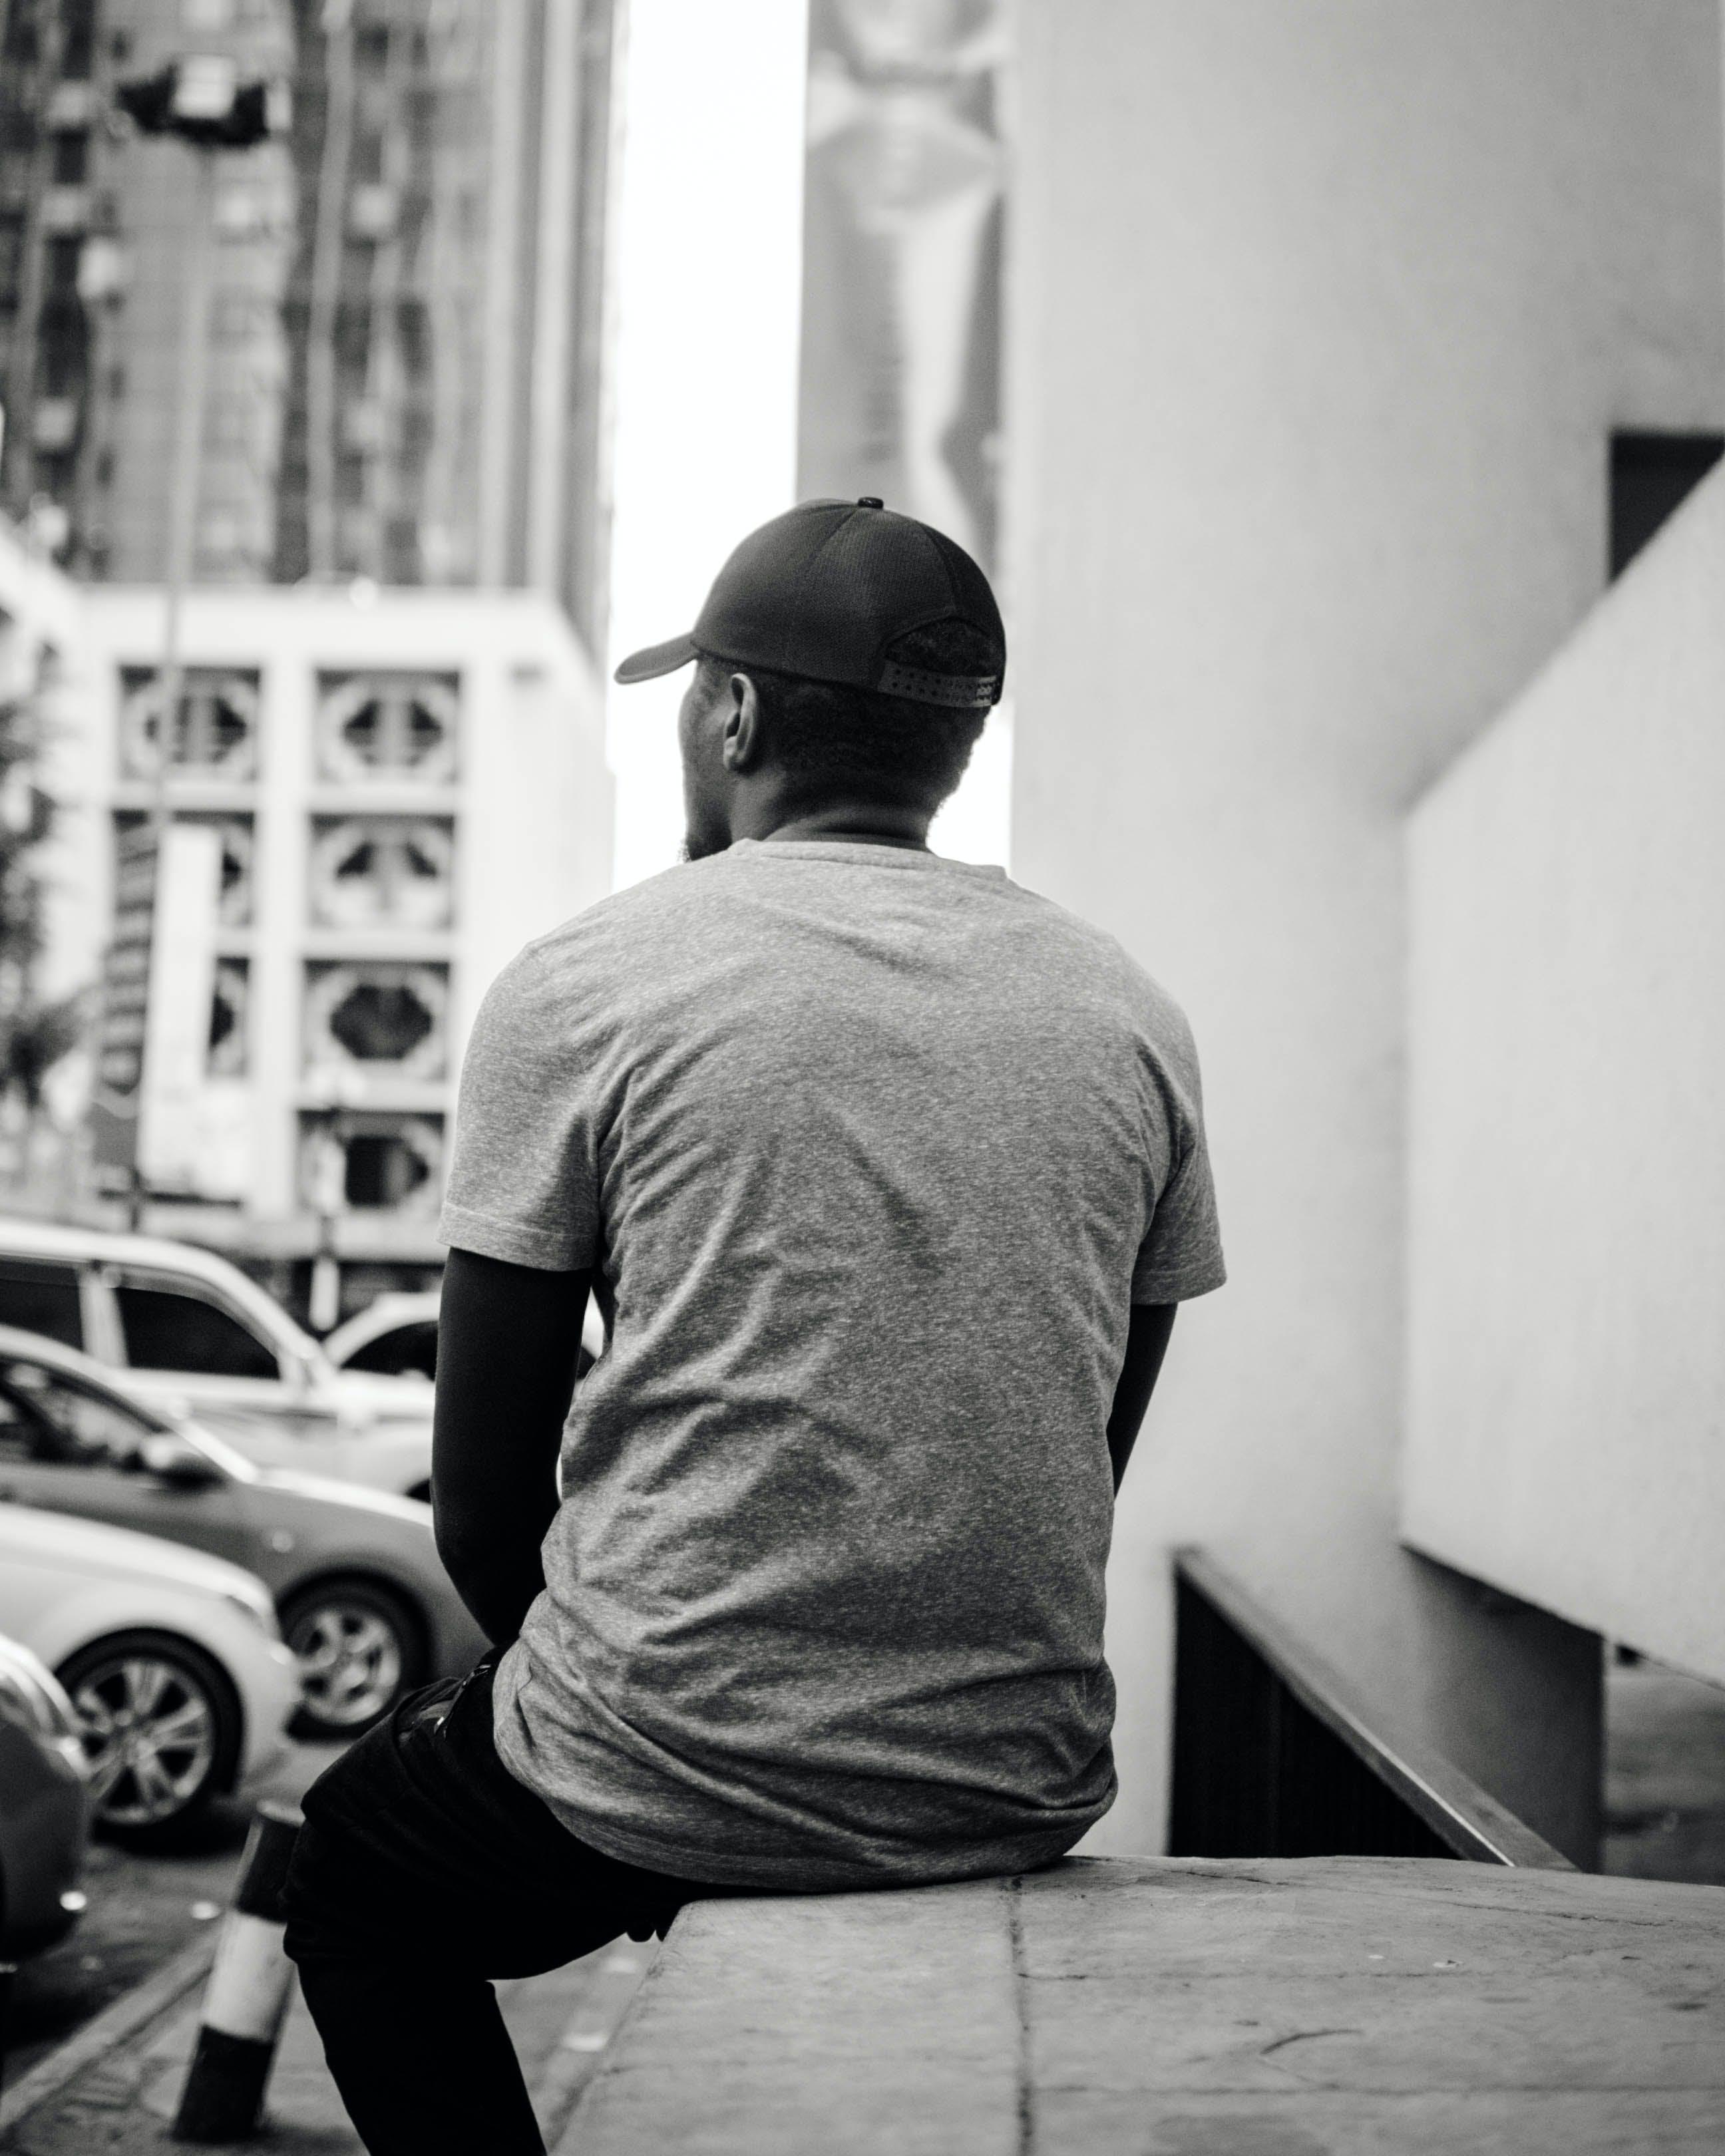 Monochrome Photo of Man Sitting On Ledge